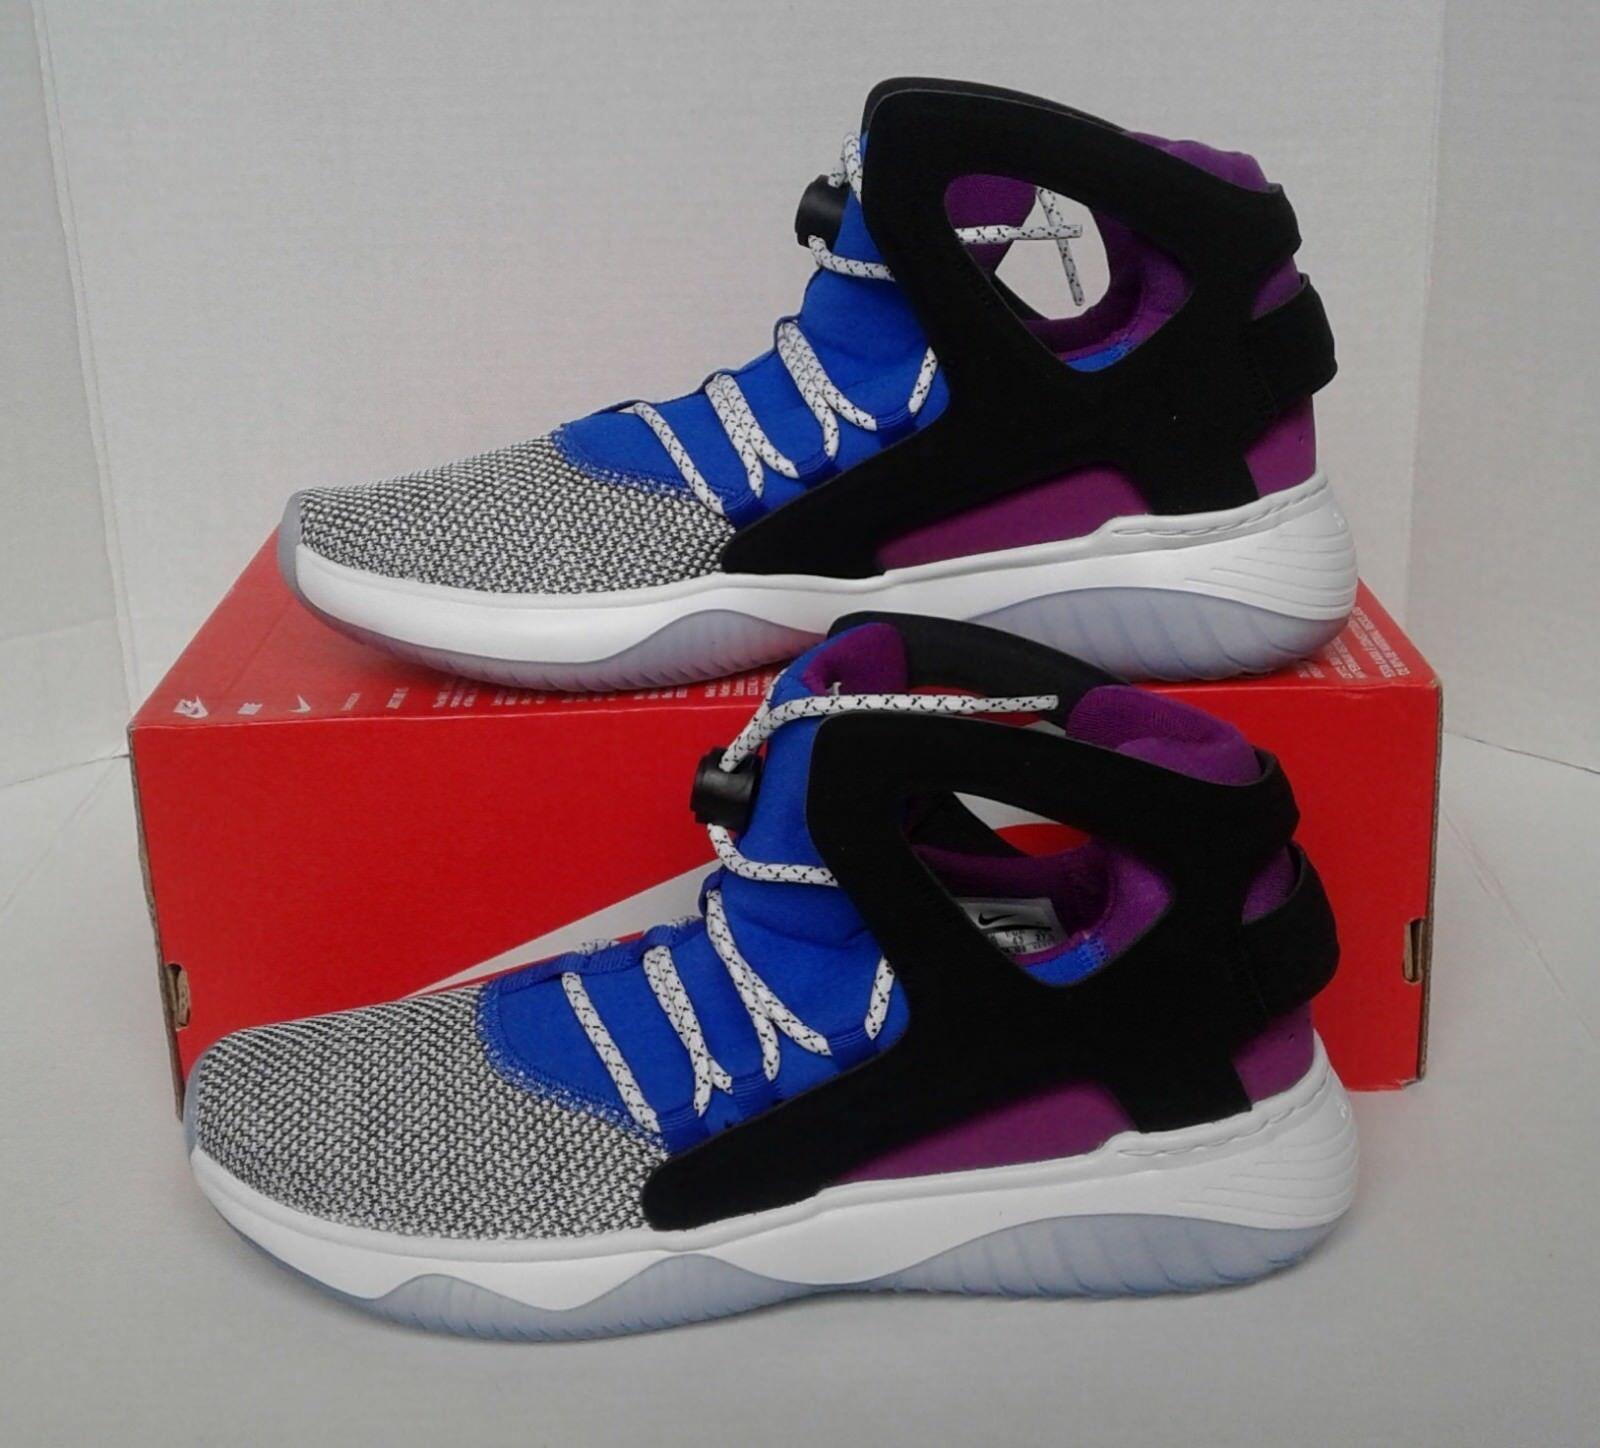 promo code 64629 78457 ... switzerland nueva nike hombre blanco ultra negro azul air flight  huarache ultra zapato reducción de precio